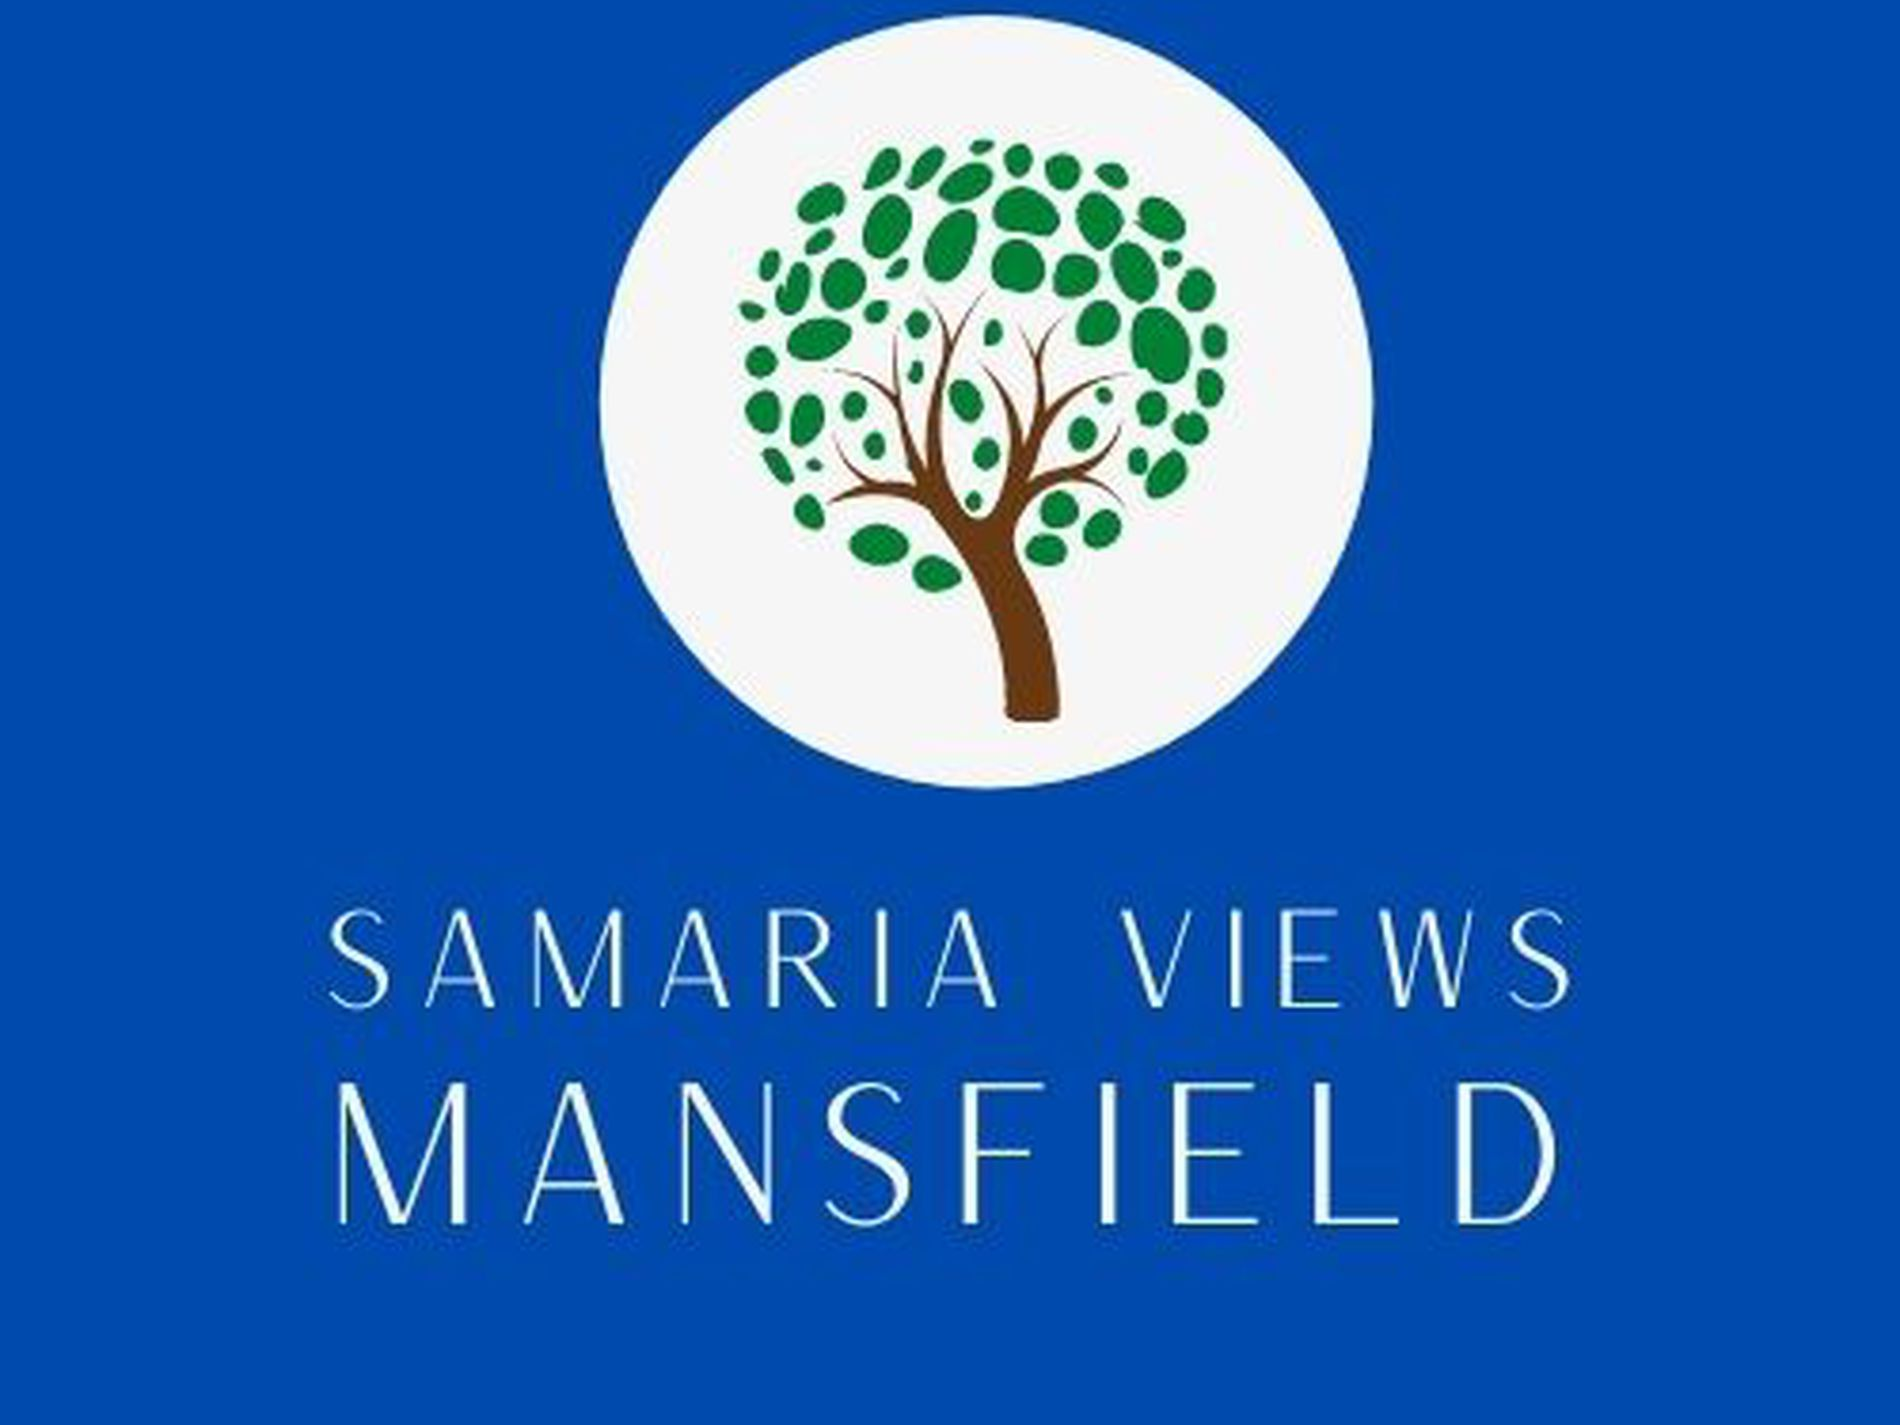 Lot 111, Samaria Views, Mansfield